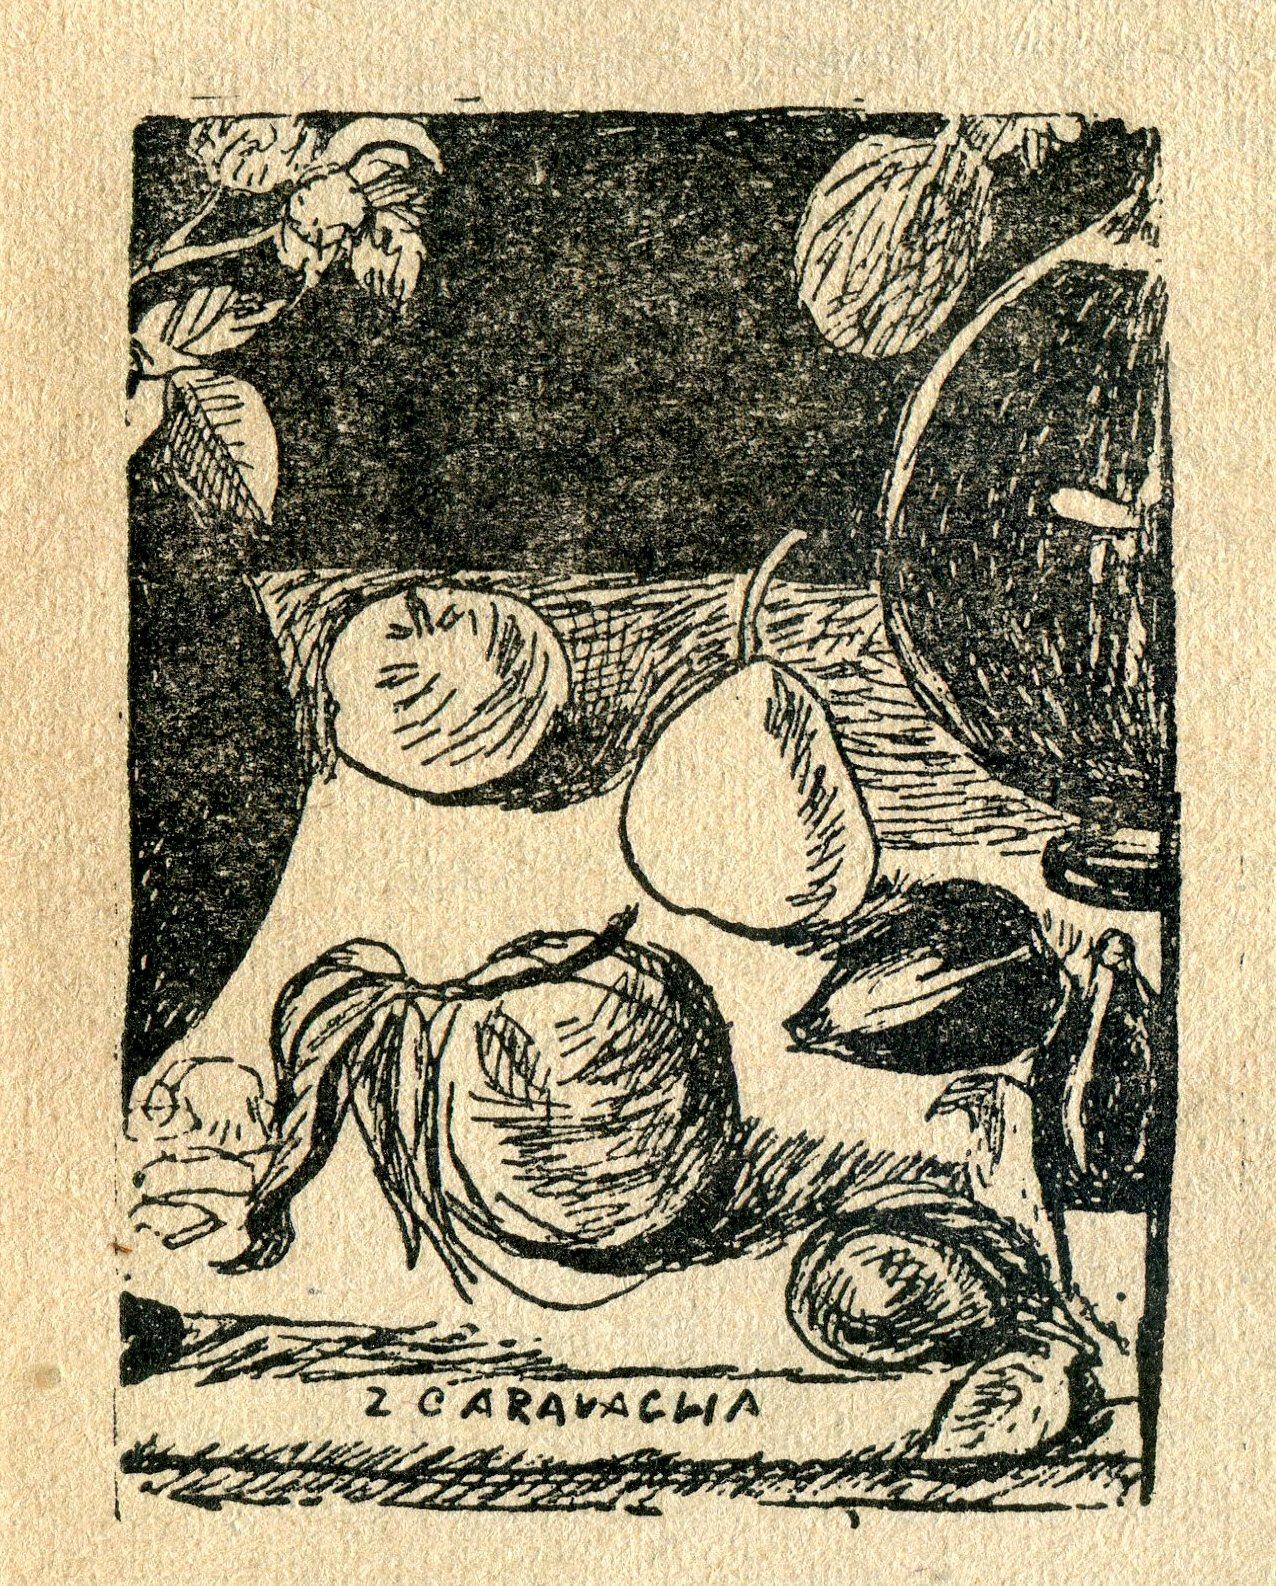 "<div class='inner-box'><div class='close-desc'></div><span class='opis'>Józef Czapski - rysunek ""Z Cranacha"", ilustrujący tekst J.Cz. pt. ""Rzeczy żywe i bez ruchu"". ""Kultura"" nr 10/72, 1953 r. s. 3</span><div class='clearfix'></div><span>Sygn. sm00253</span><div class='clearfix'></div><span>© Instytut Literacki</span></div>"